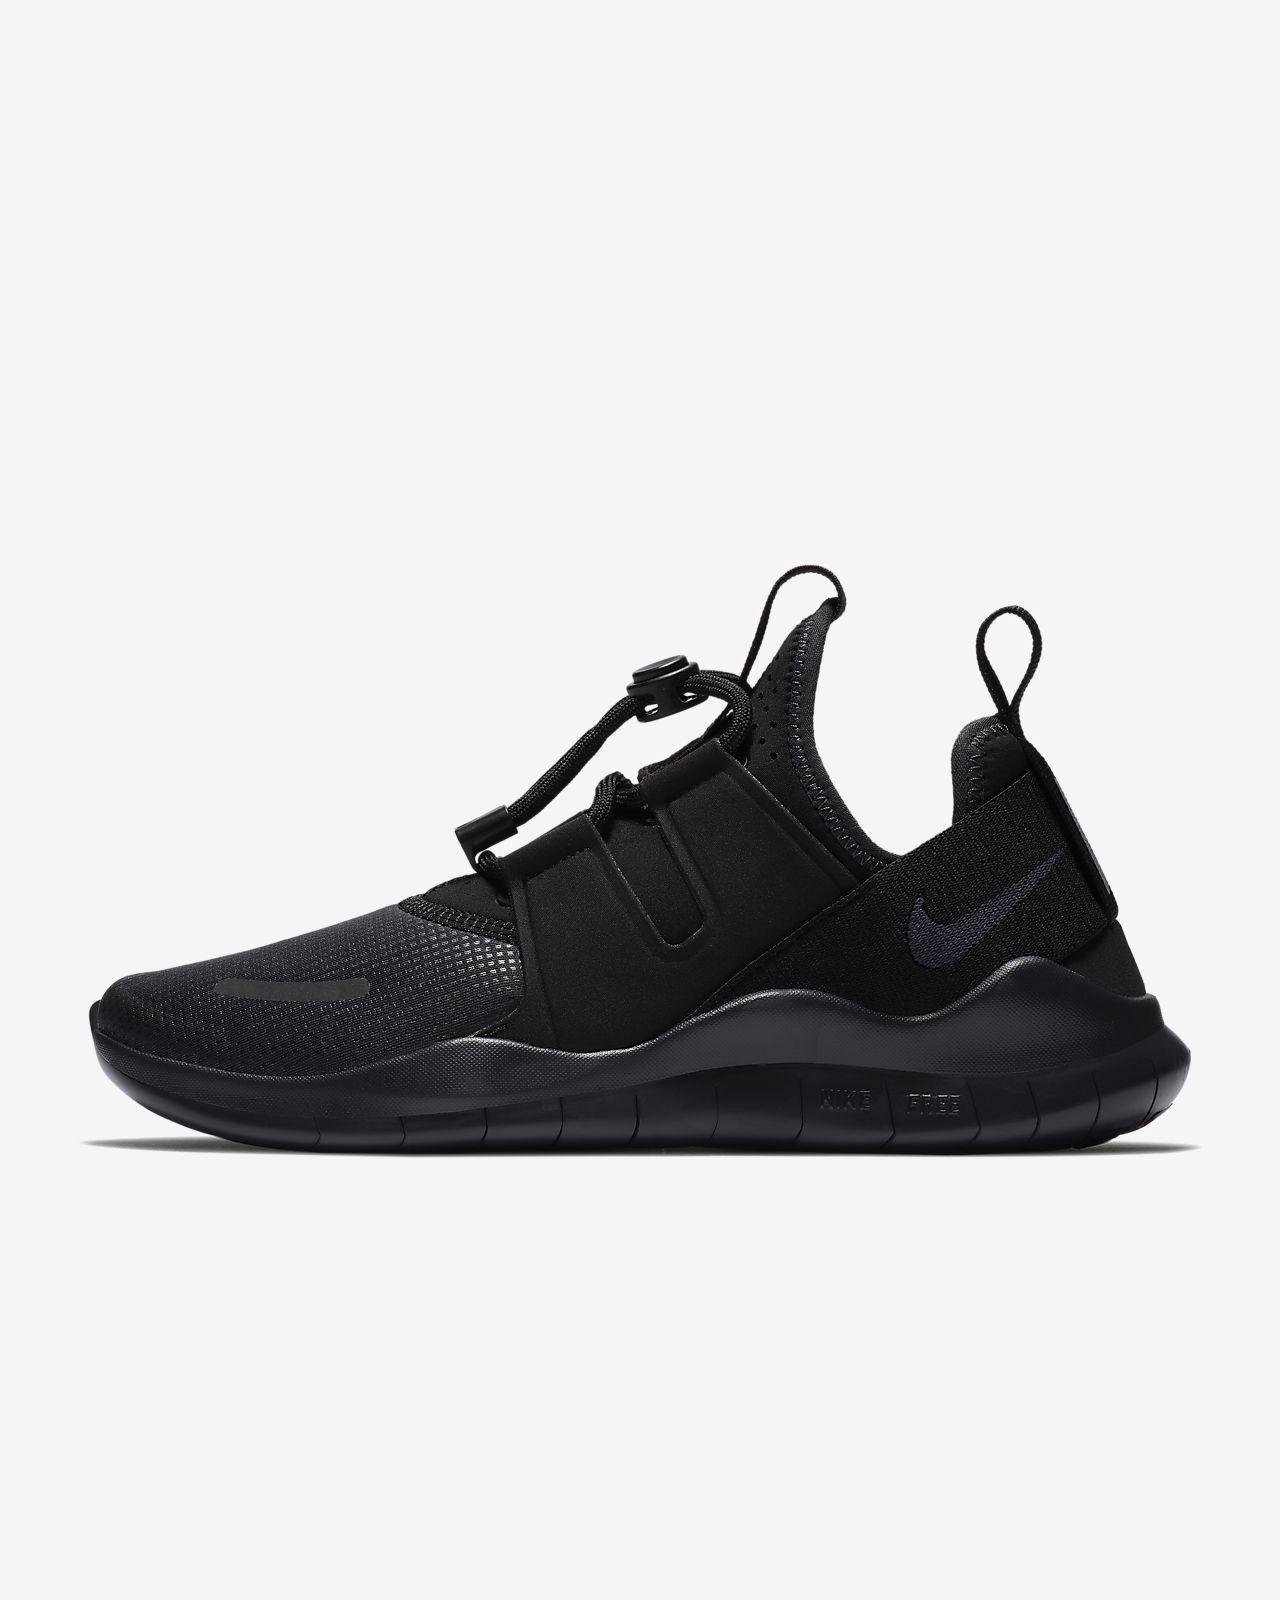 f65ba0a3f9ac6 Nike Free RN Commuter 2018 Men s Running Shoe Size 12.5 (Black) in ...